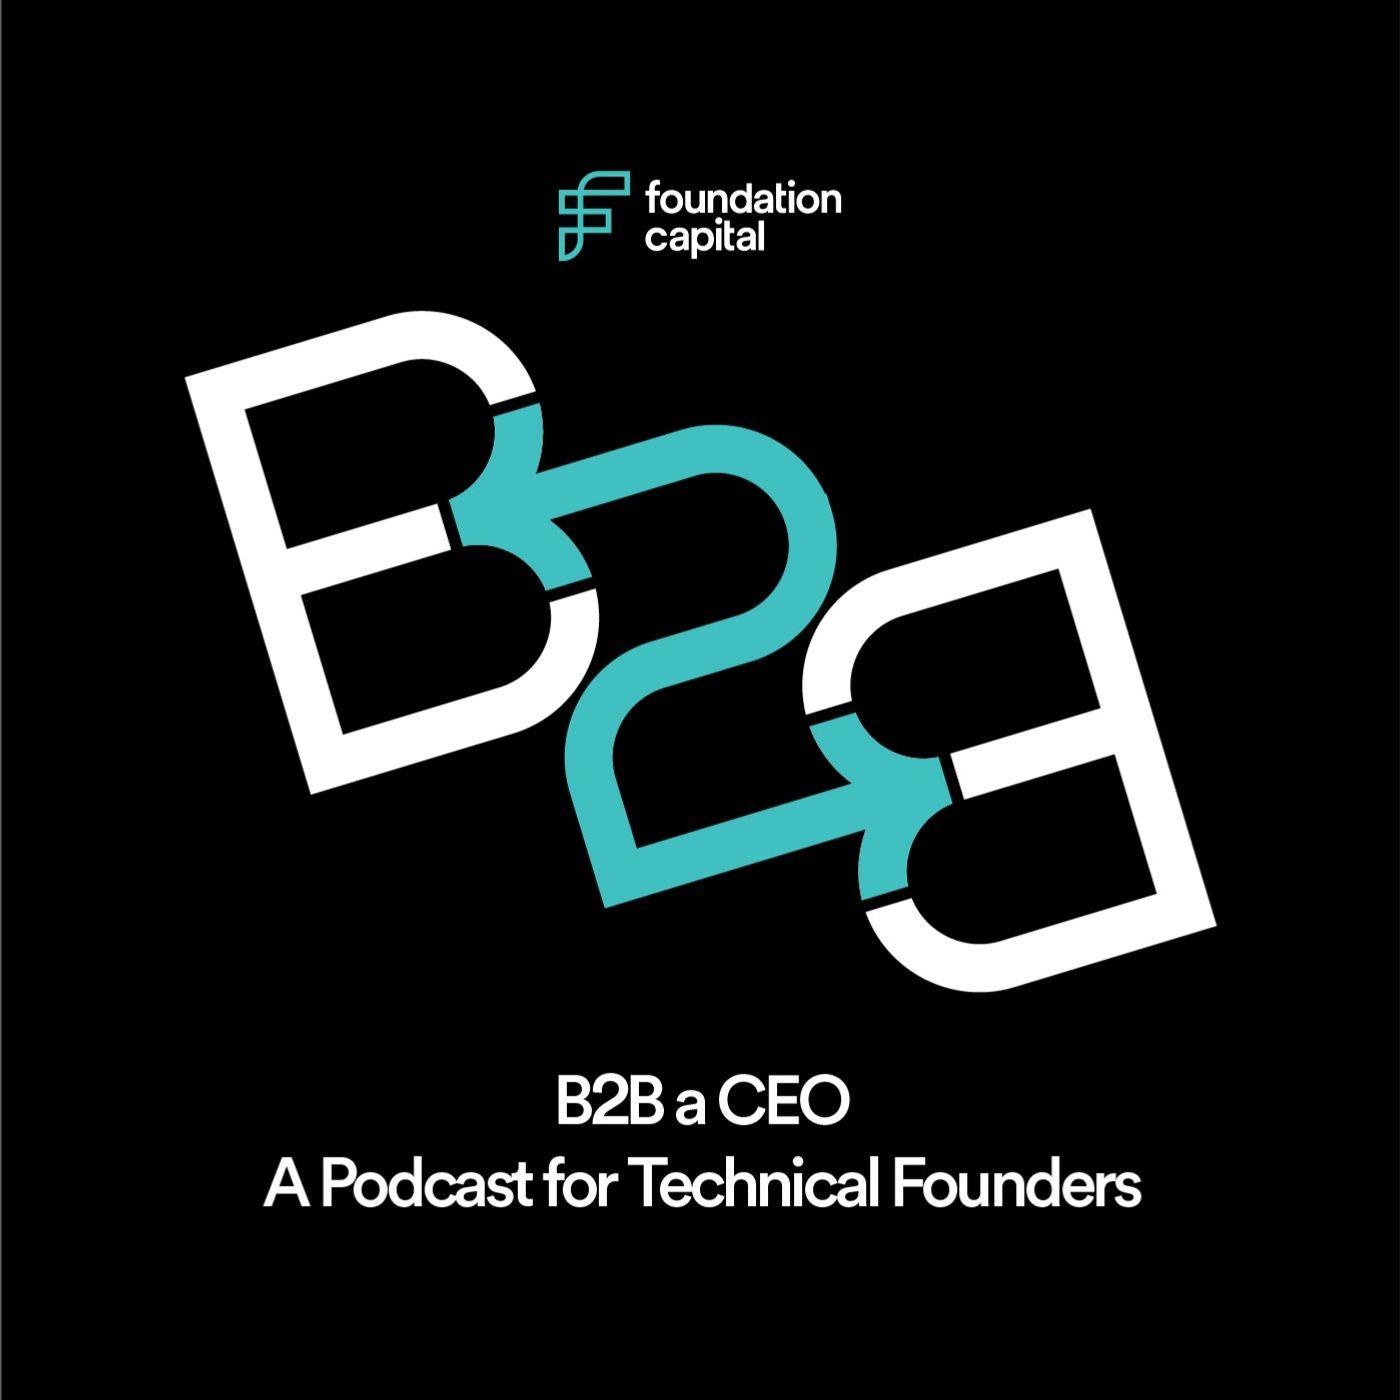 How to B2B a CEO (with Ashu Garg)